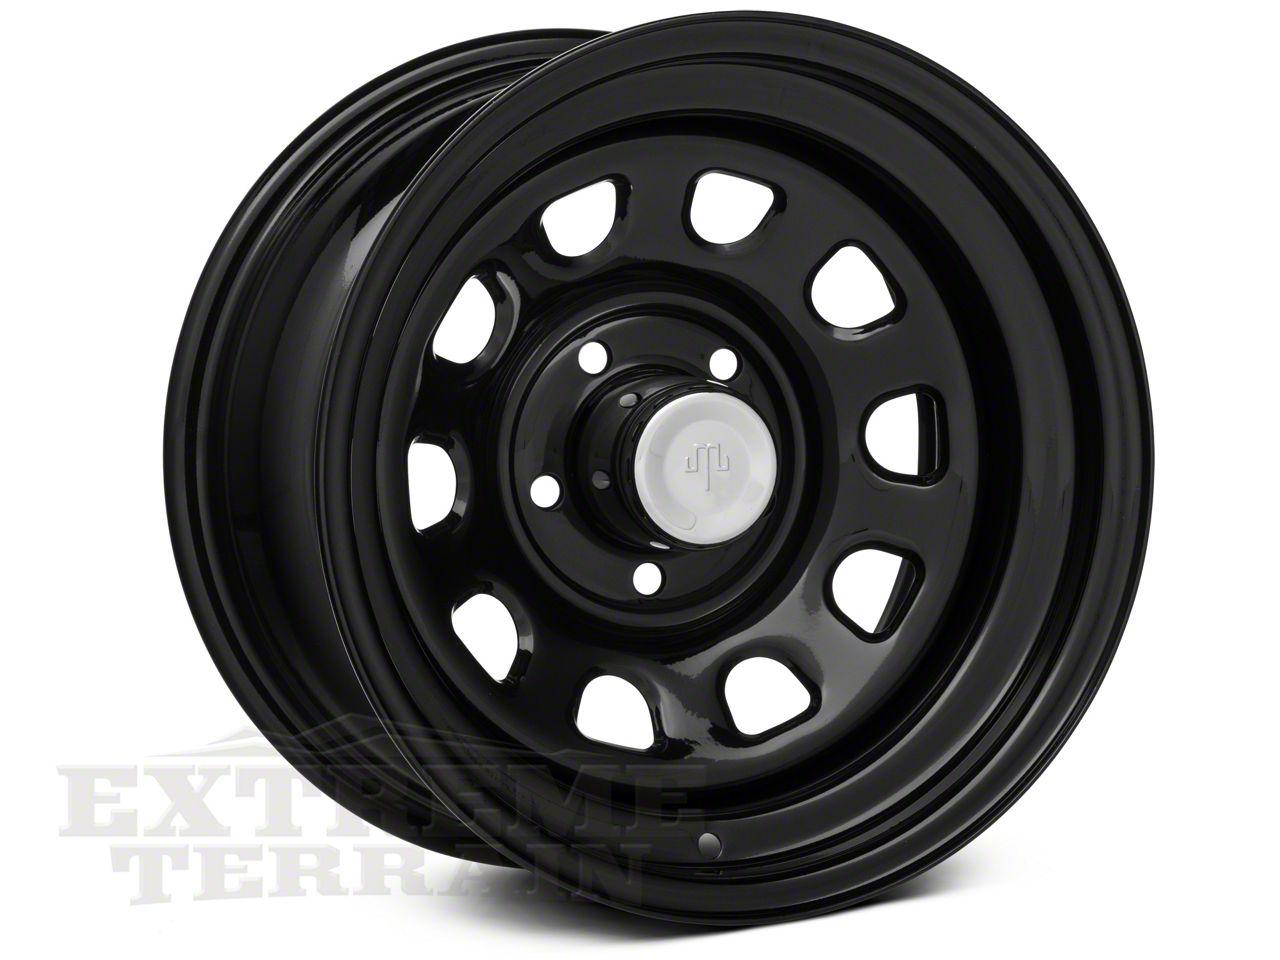 Mammoth D Window Black Steel Wheel 15x8 Wheel & Mickey Thompson Deegan 38 31x10.50R15 Tire Kit (87-06 Jeep Wrangler YJ & TJ)